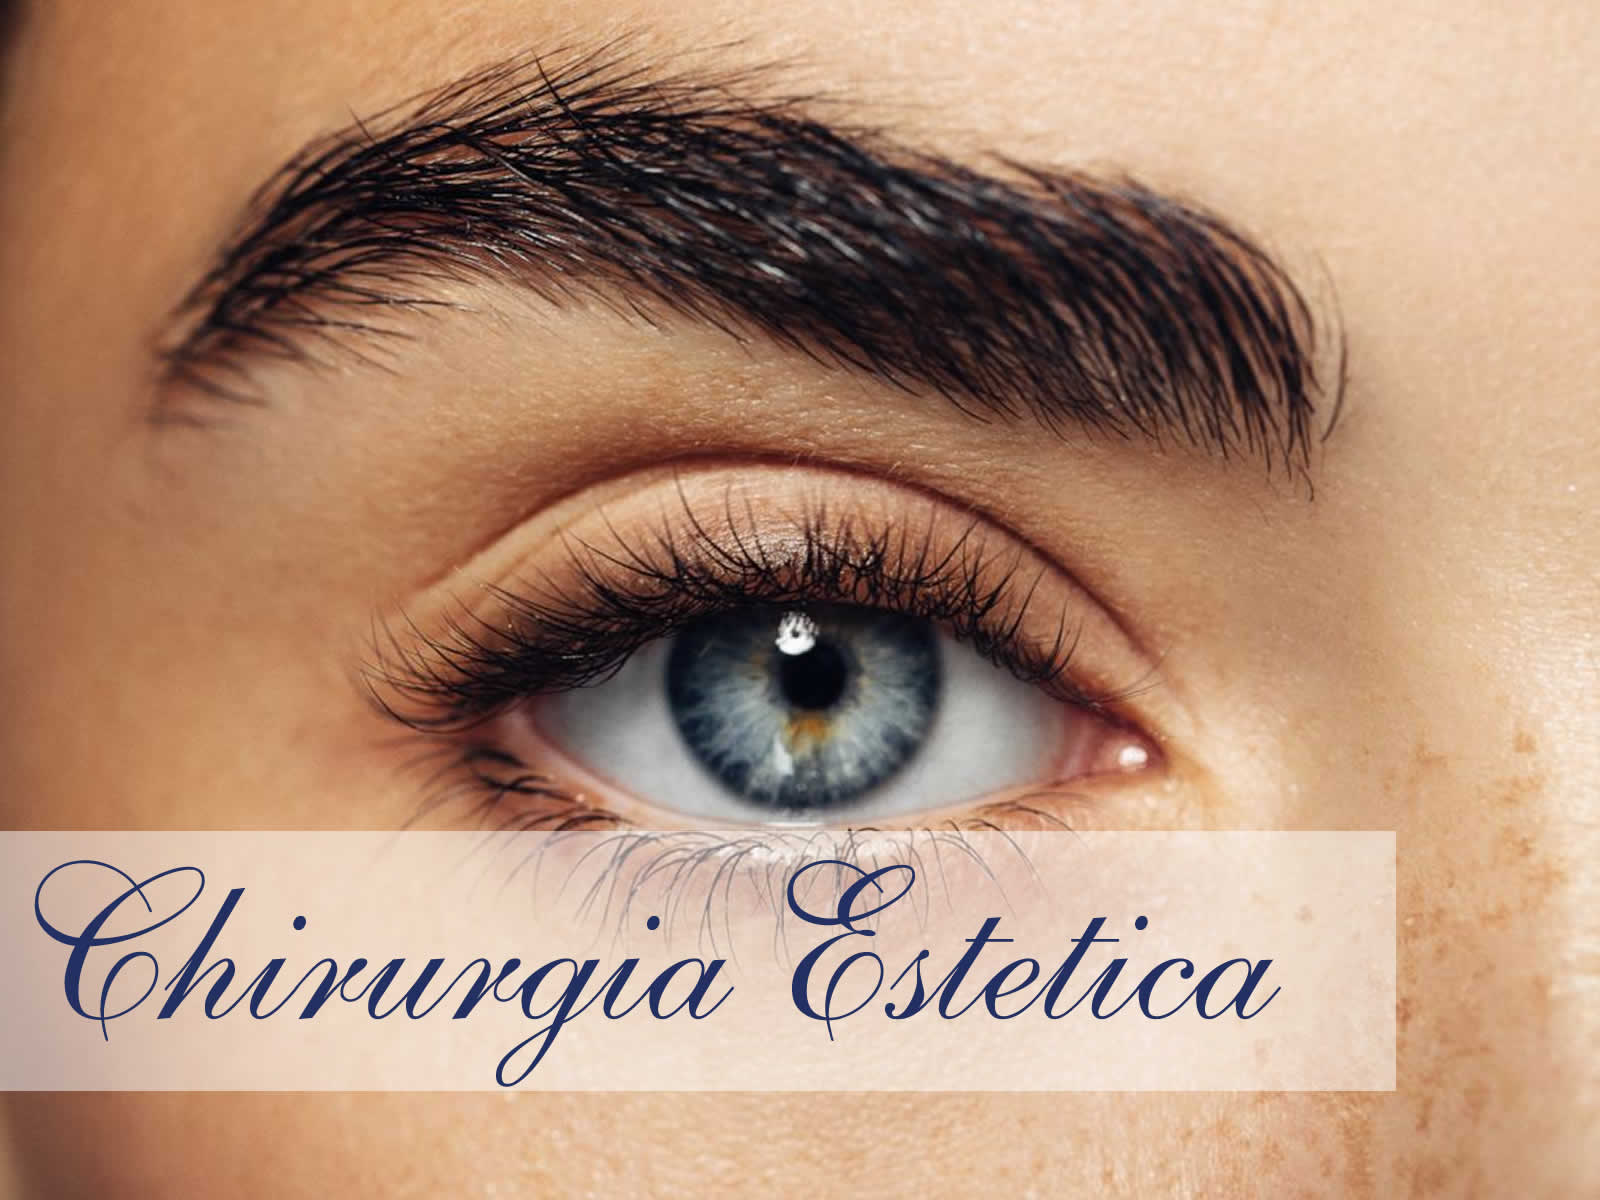 Cassia - Chirurgo Estetico: Blefaroplastica a Cassia